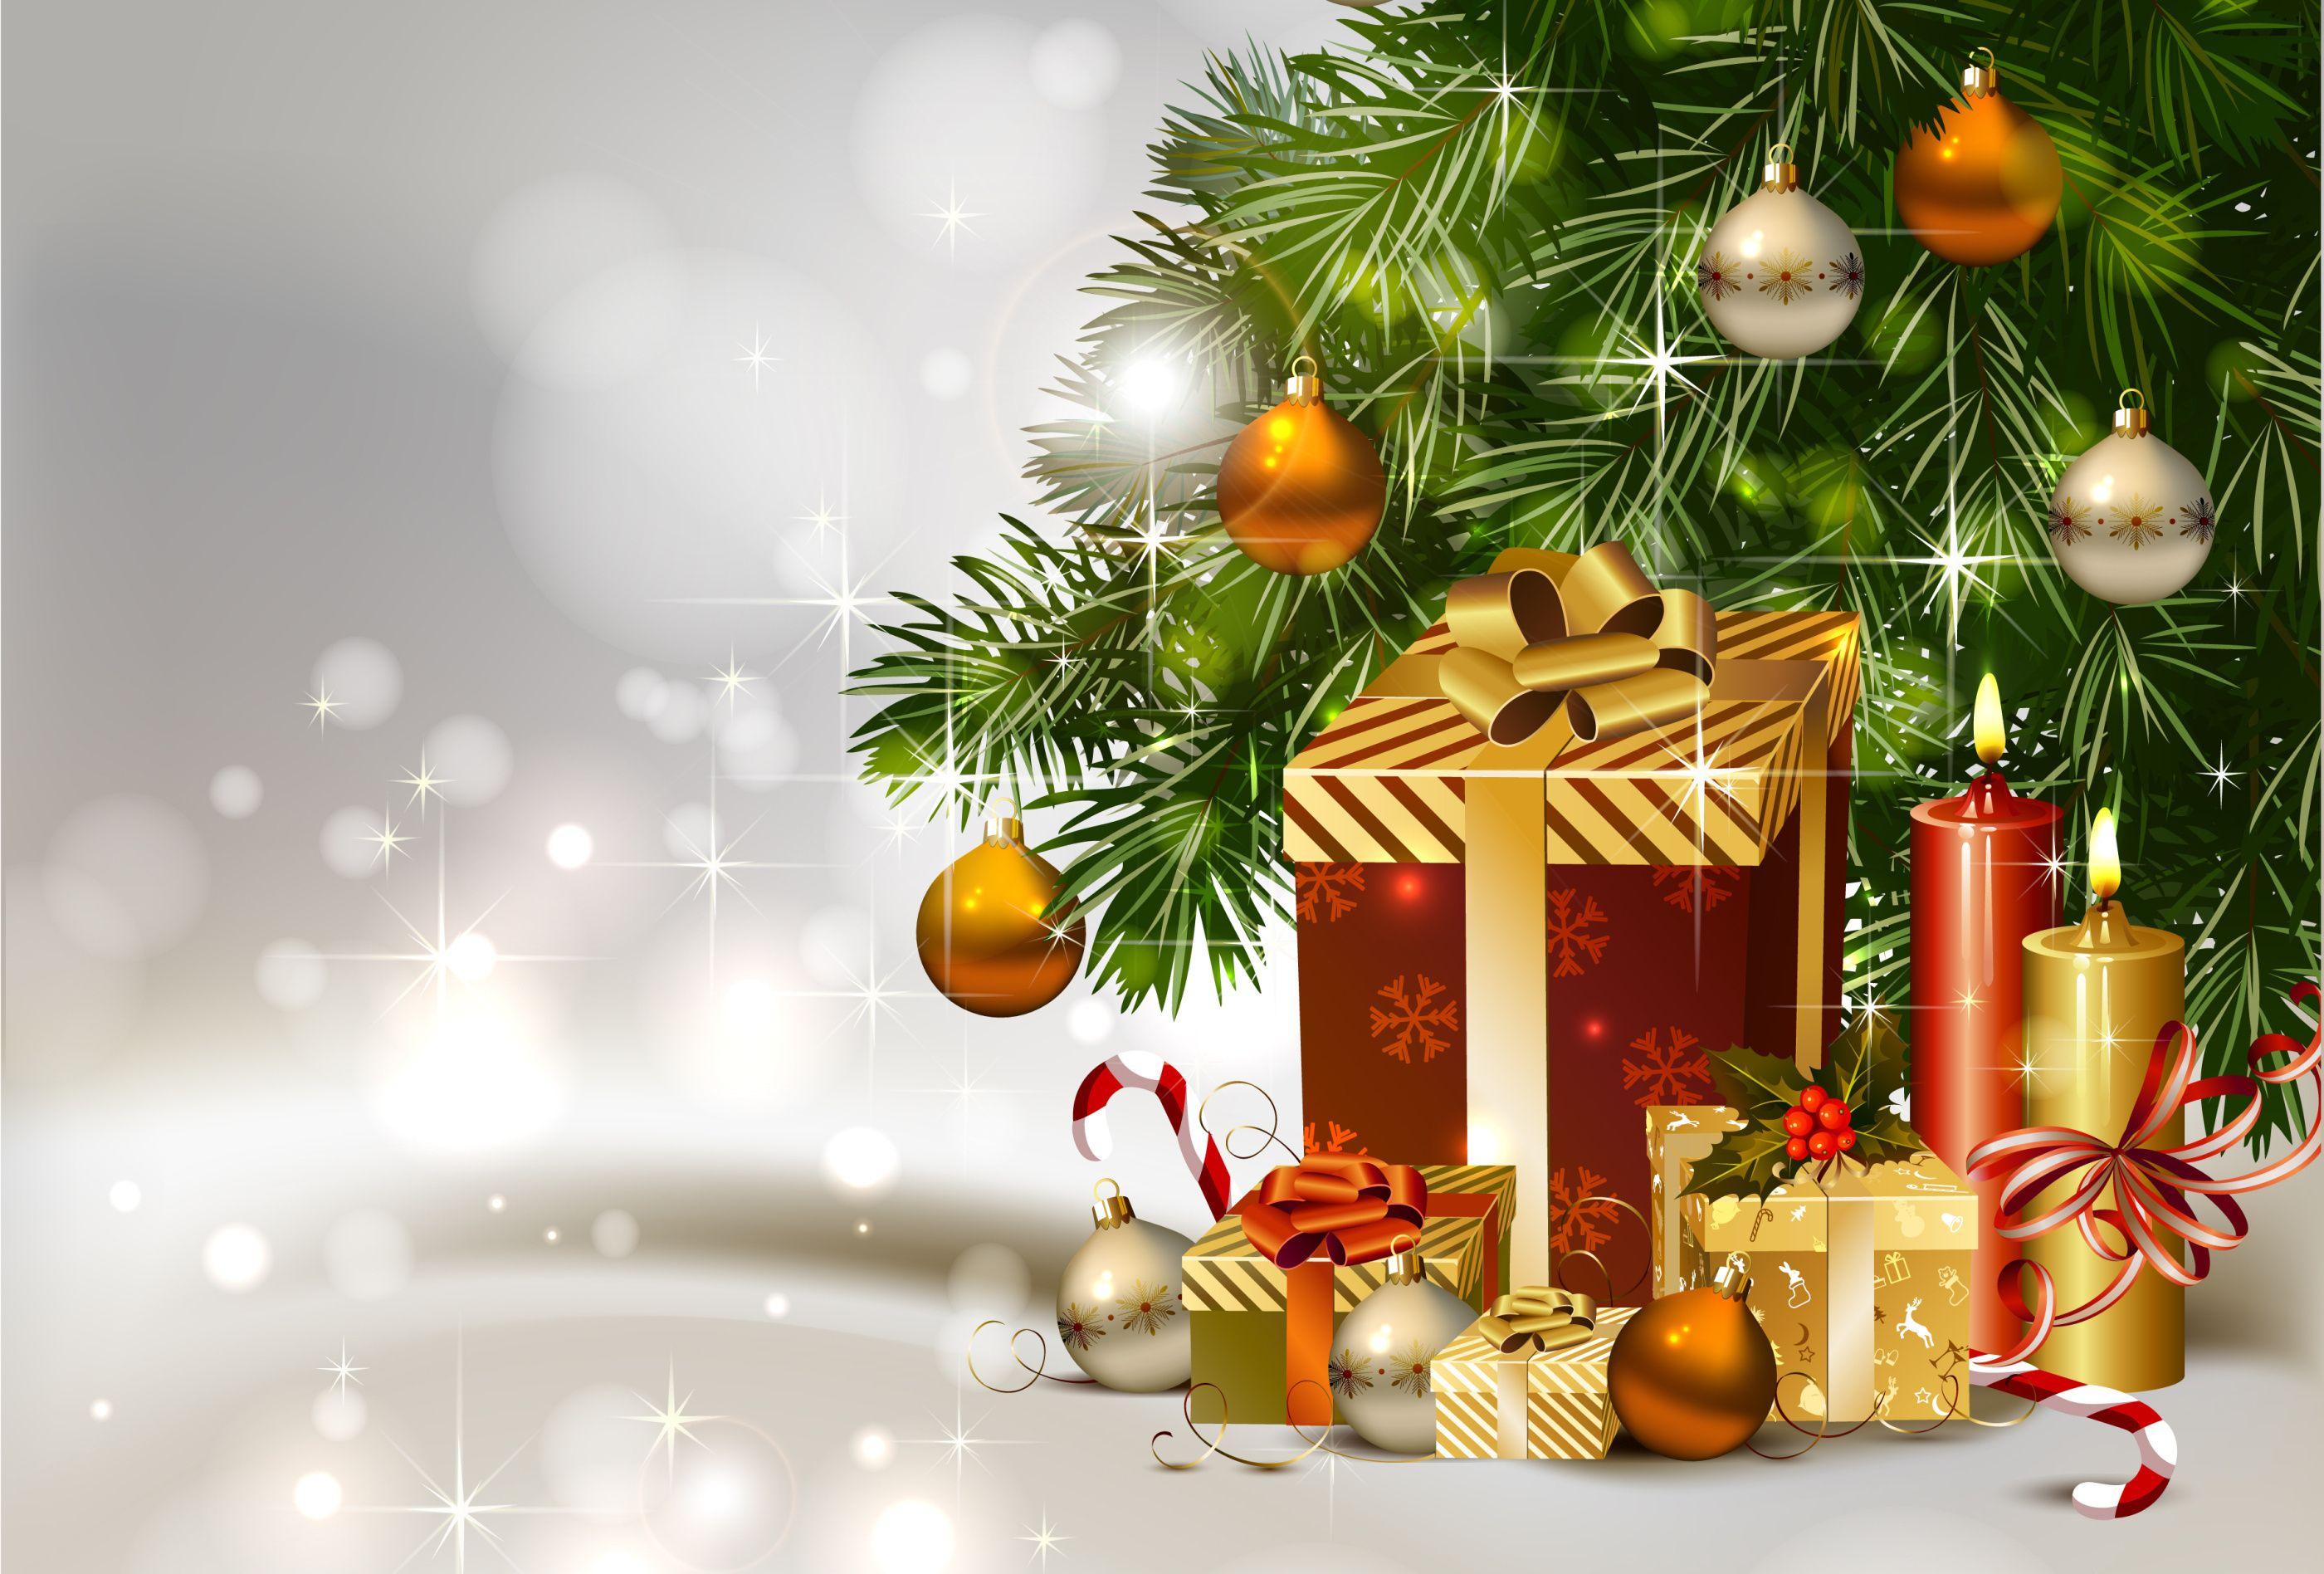 Похожее изображение Christmas wallpaper free, Merry